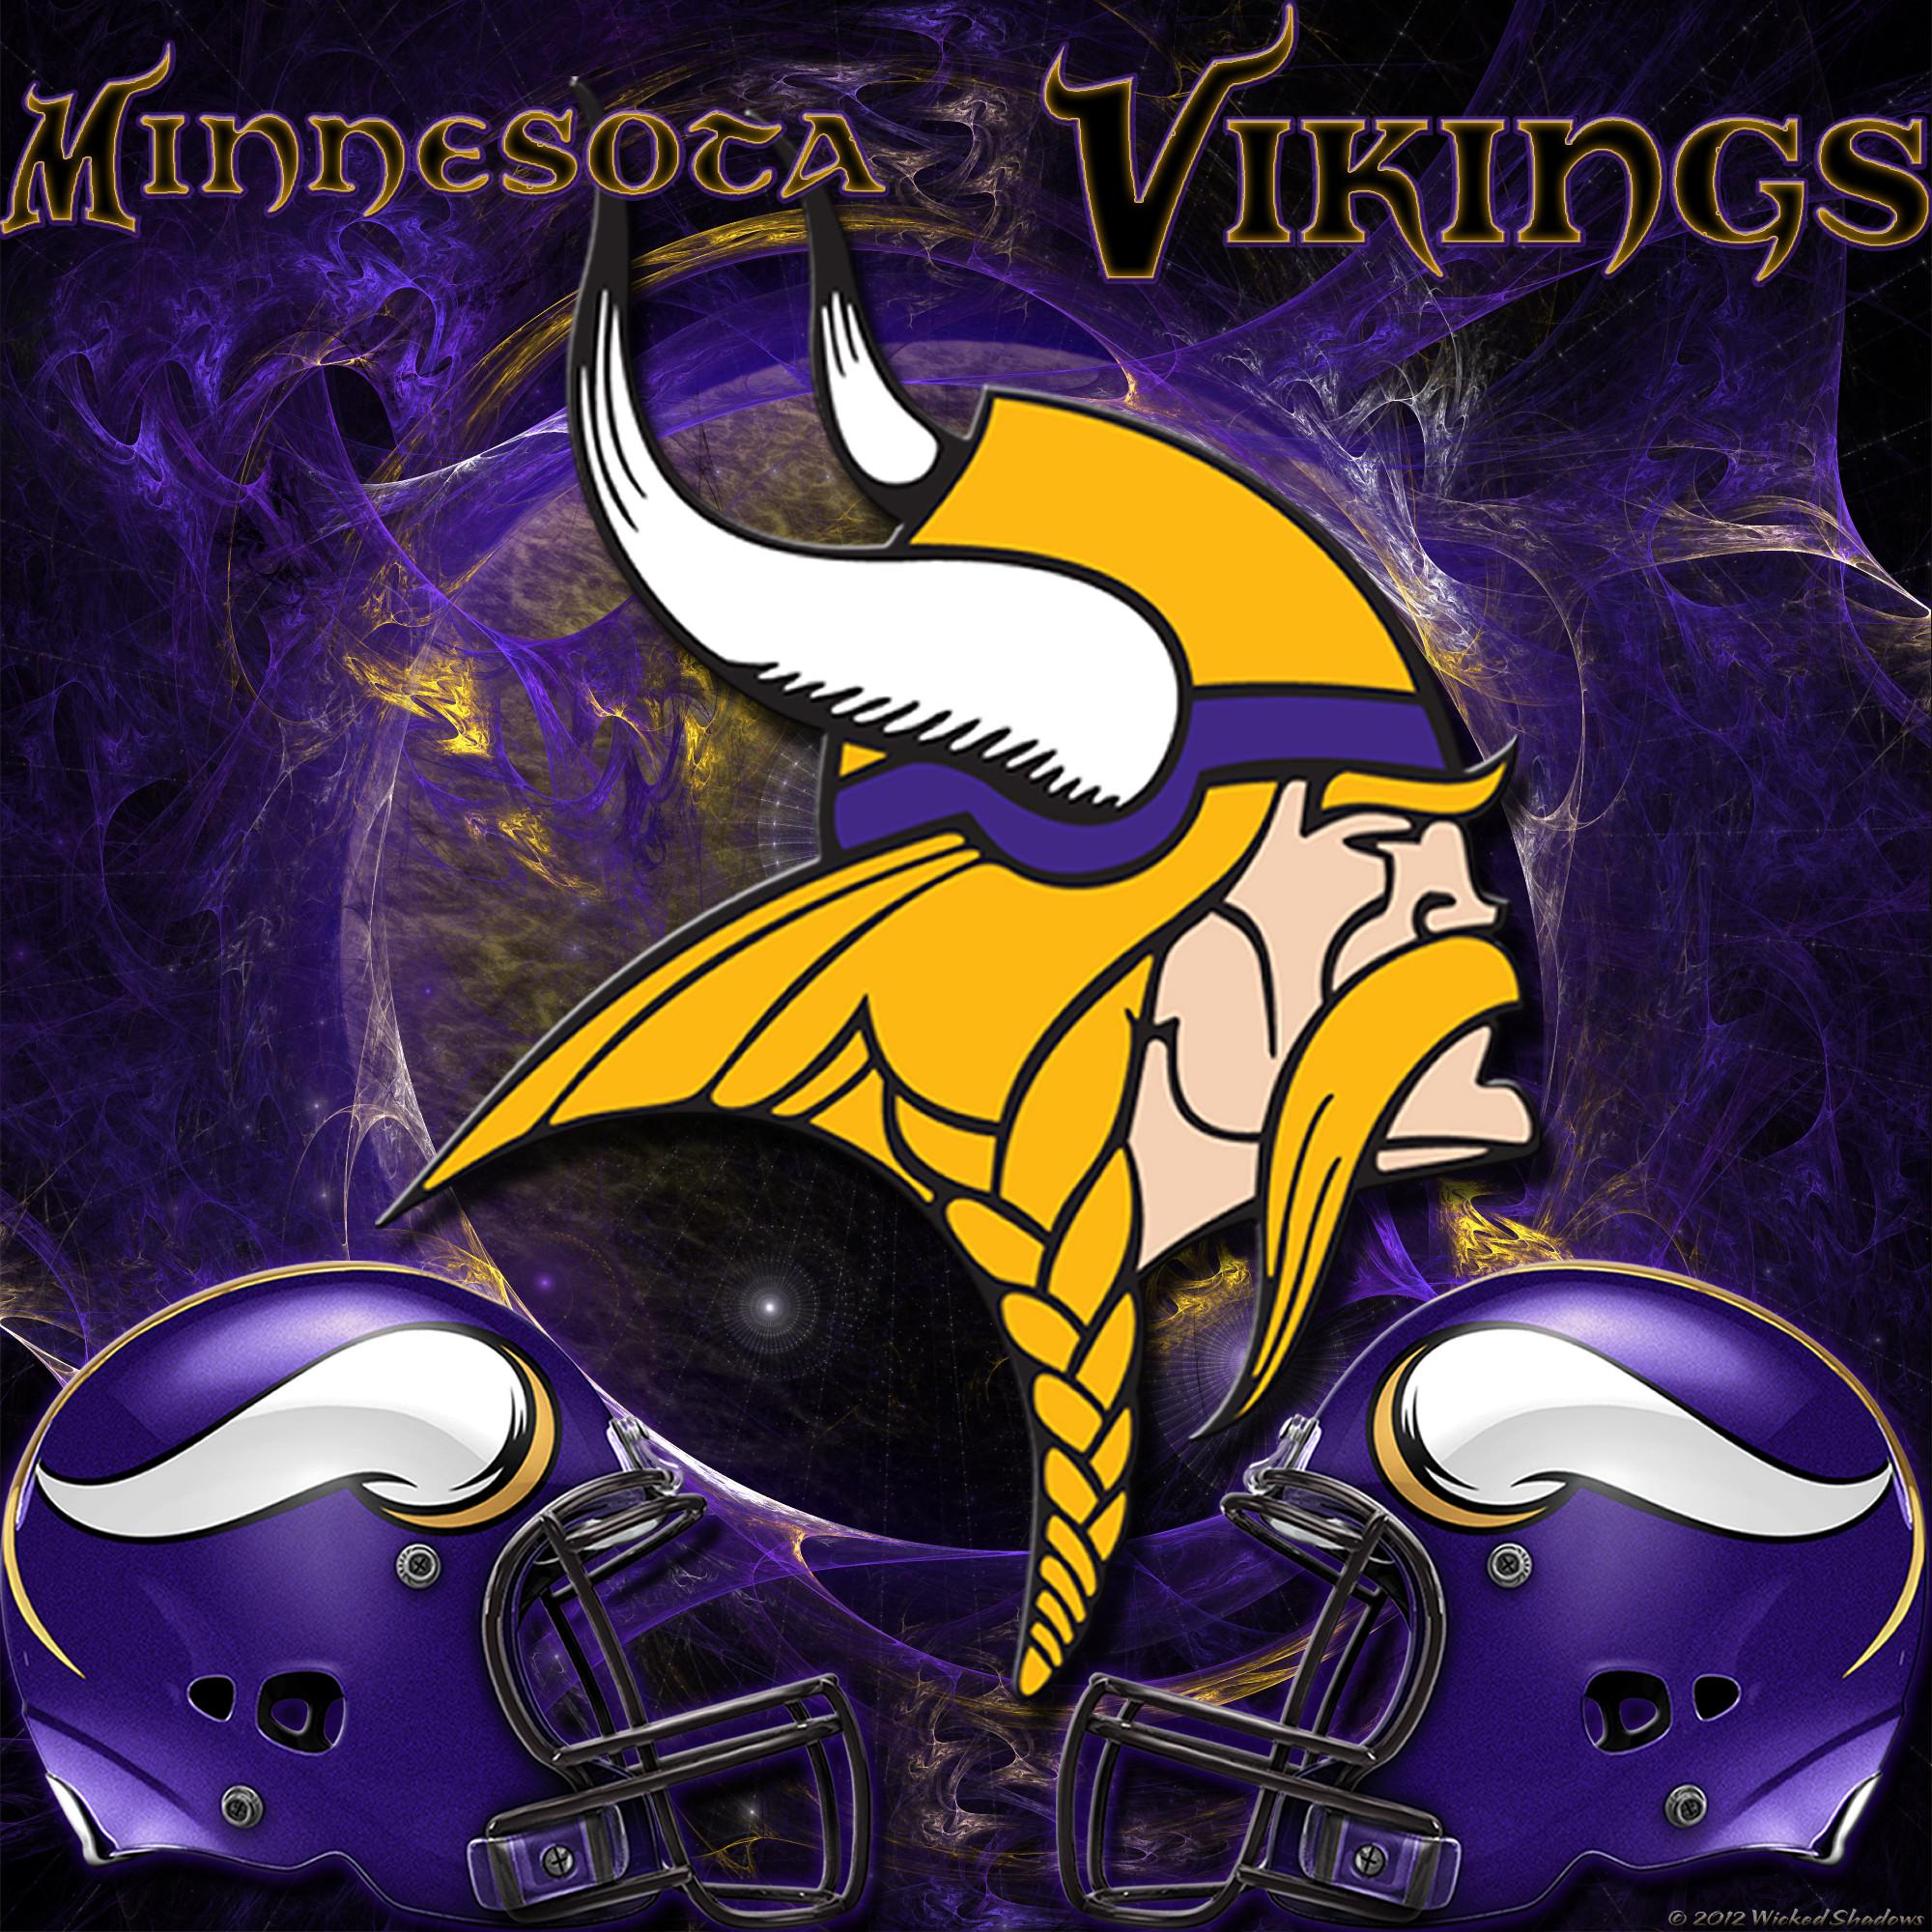 Minnesota Vikings Logo Images Wallpaper (66+ Images